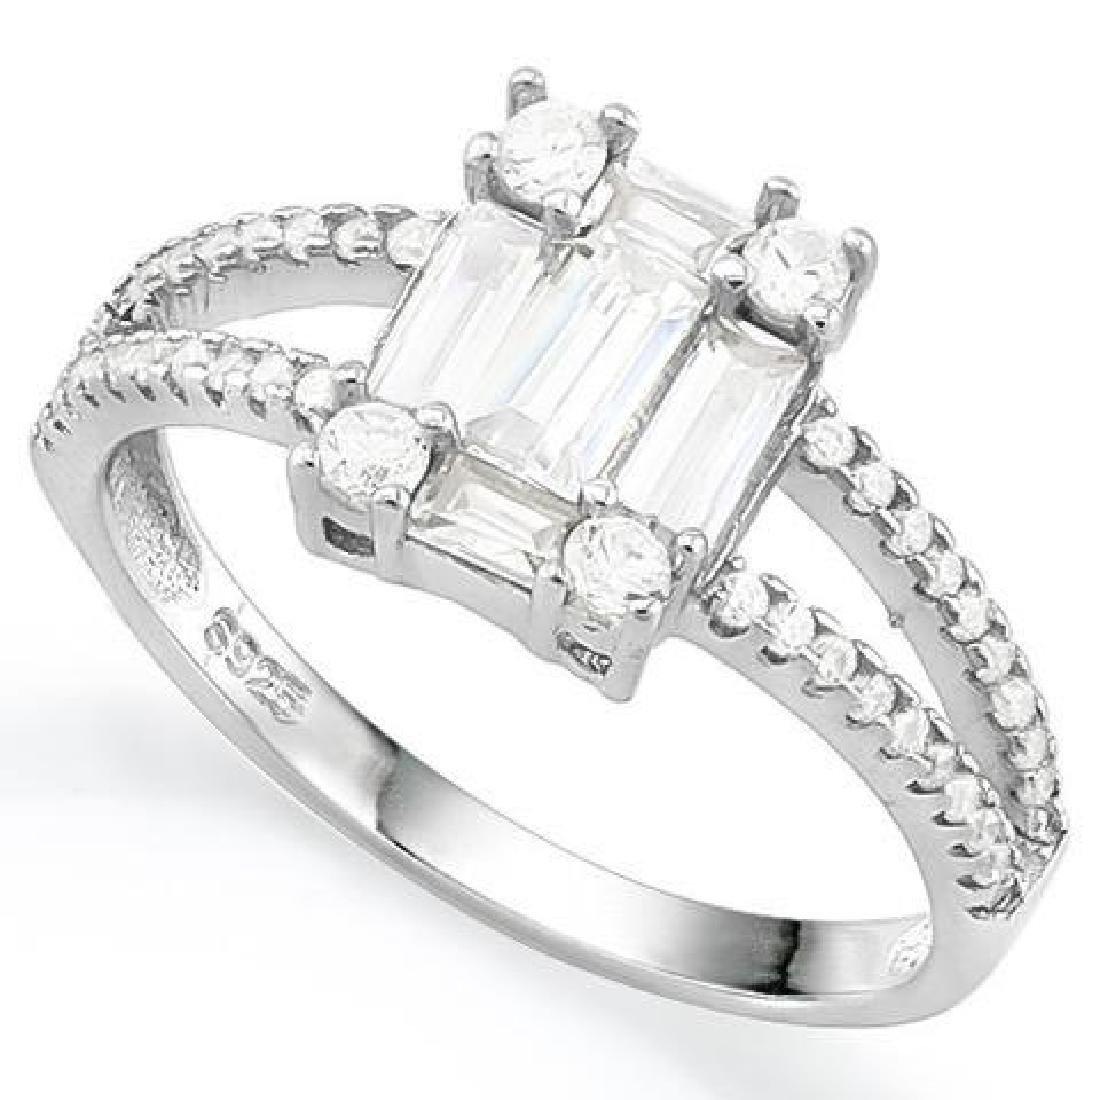 1 3/4 CARAT (49 PCS) FLAWLESS CREATED DIAMOND 925 STERL